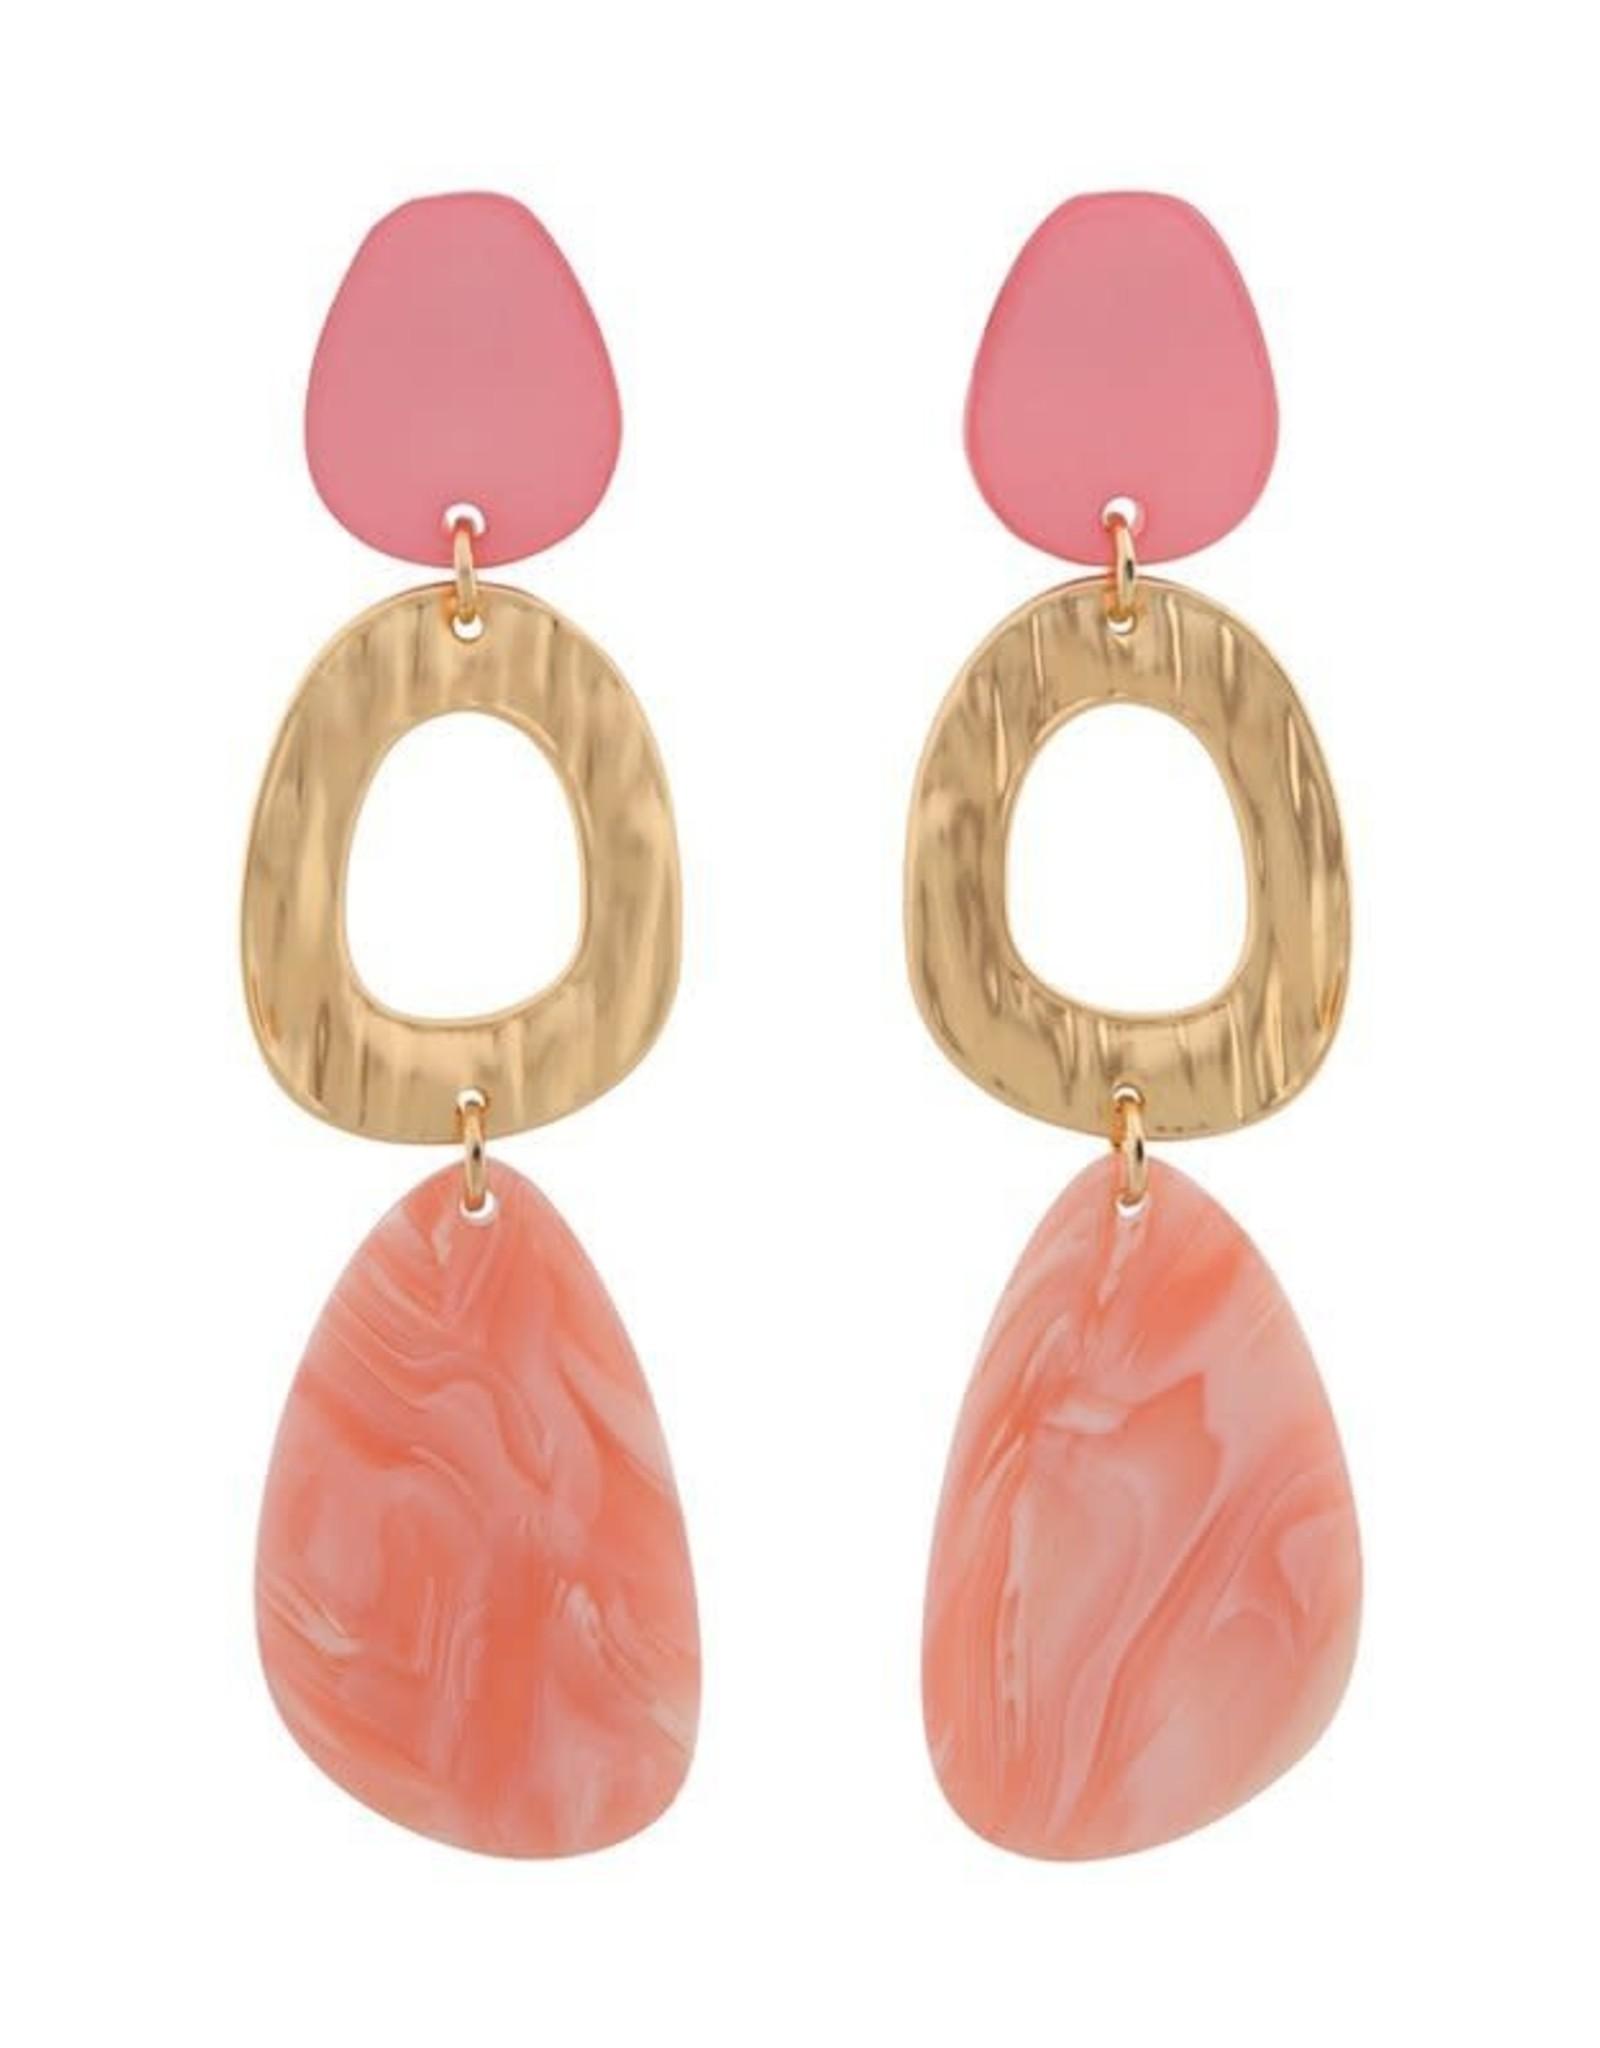 Biba Biba oorhanger licht roze